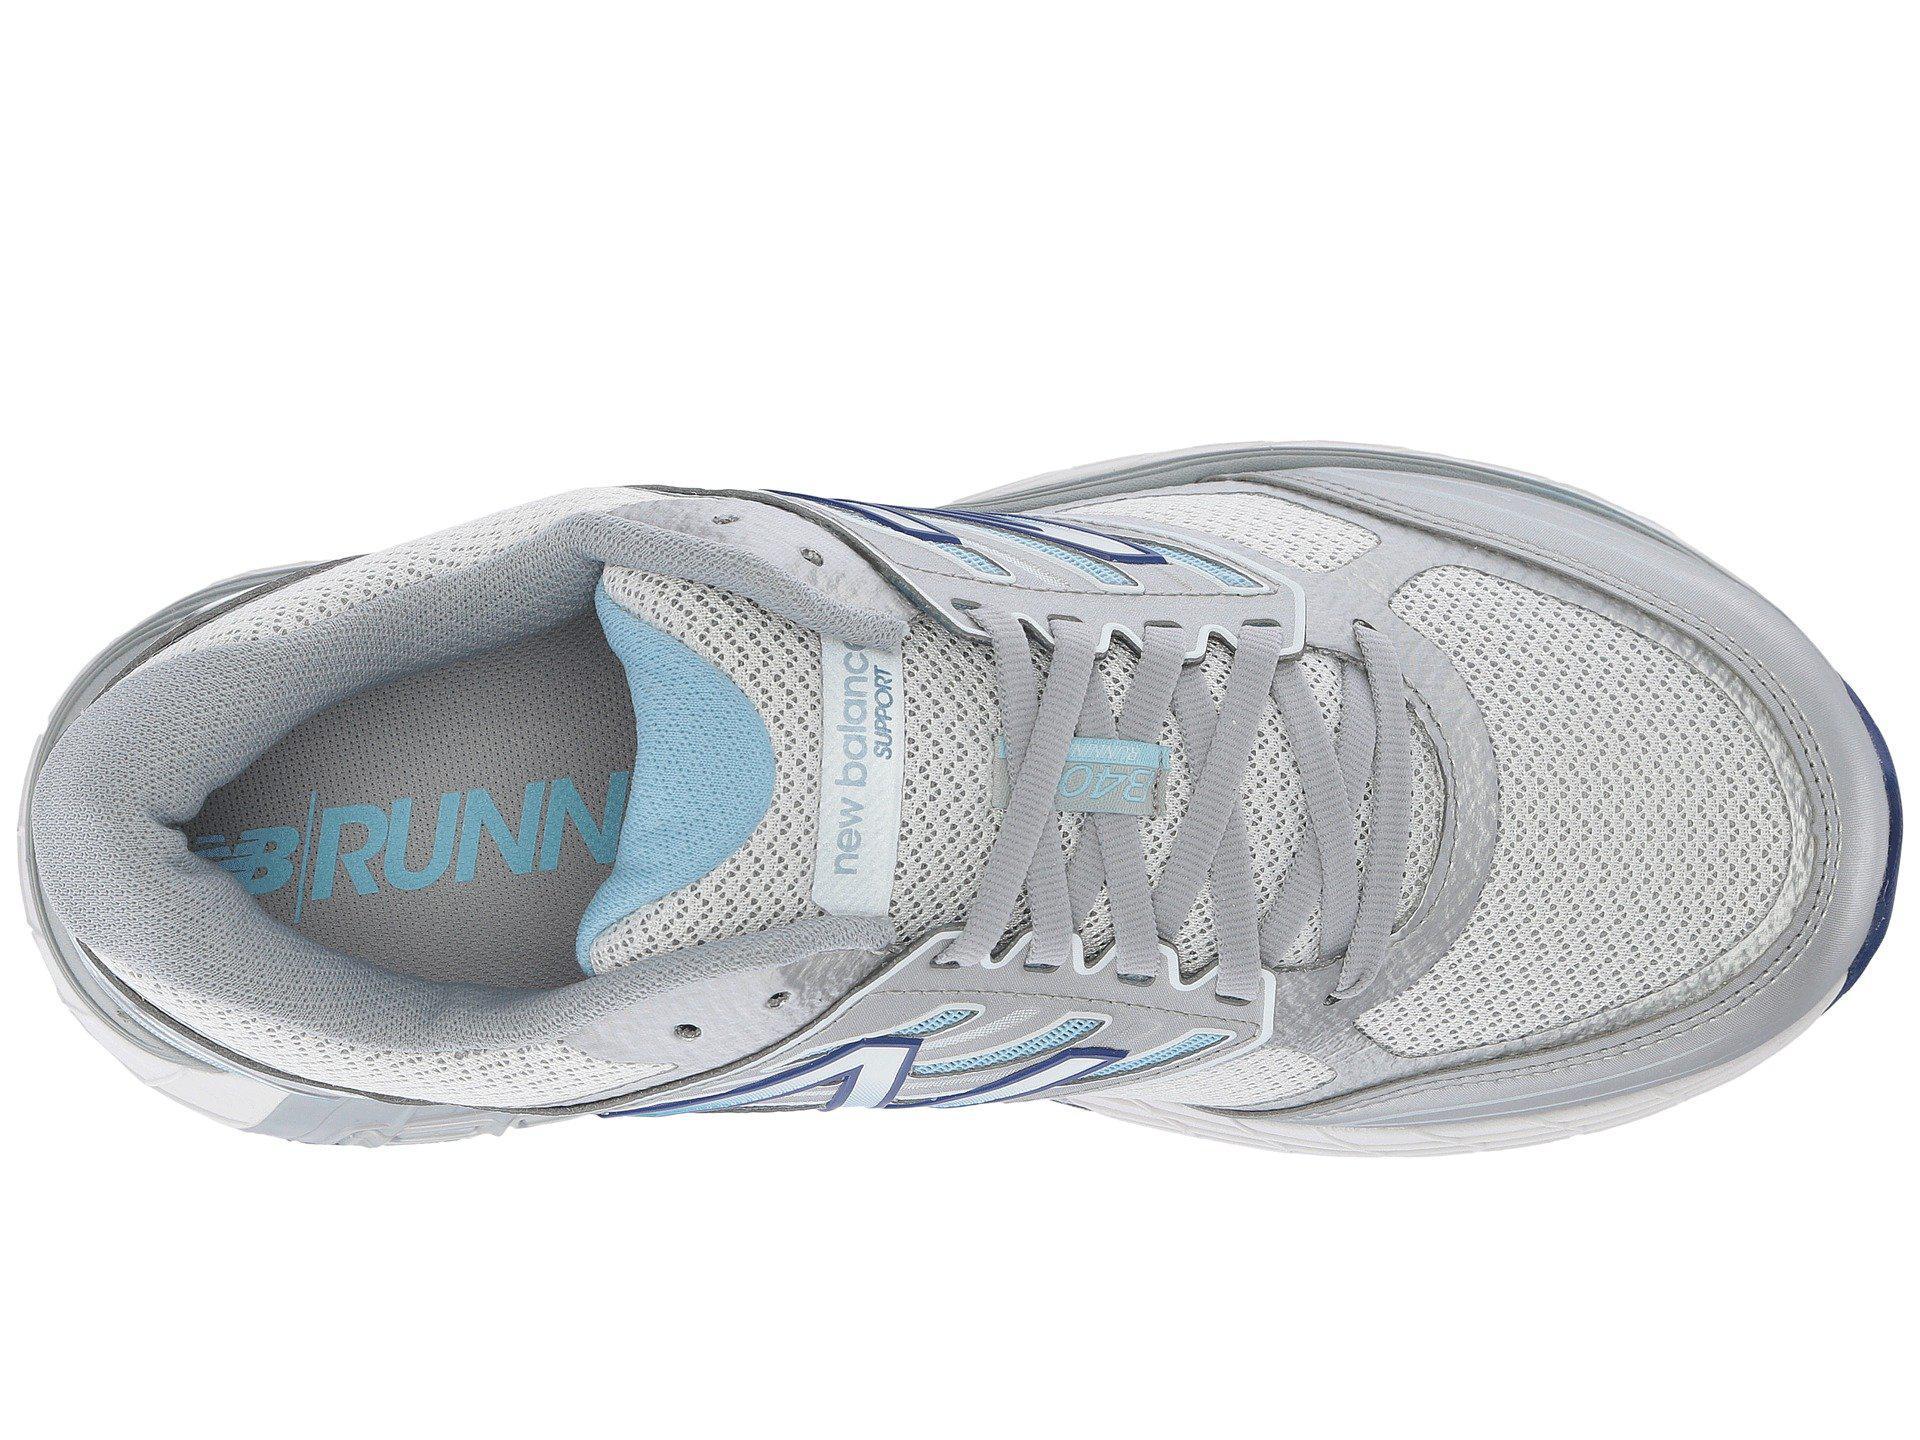 Lyst - New Balance 1340v3 (white clear Sky) Women s Running Shoes 1ecc60129b2